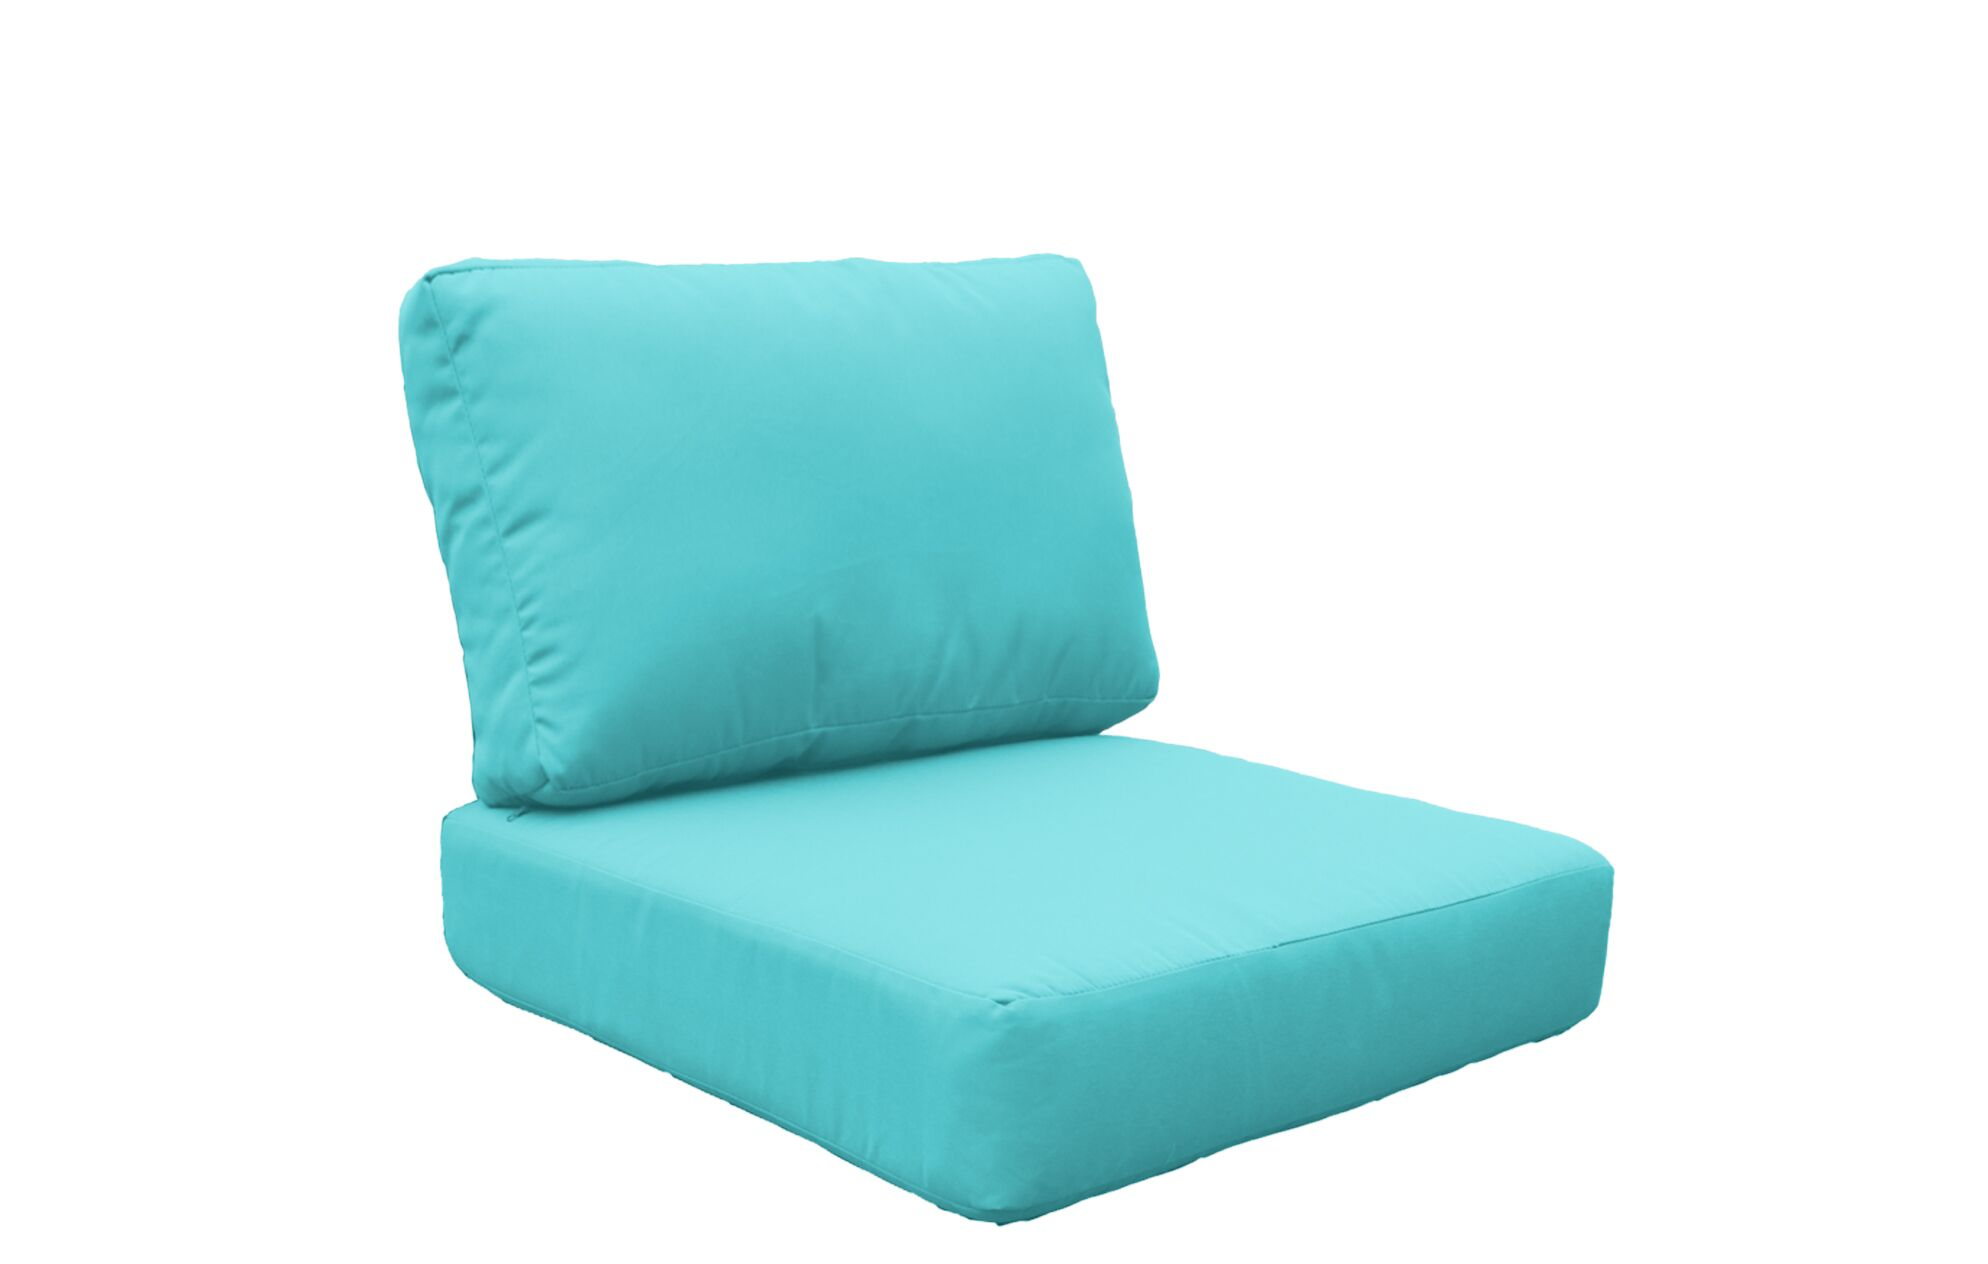 Coast 8 Piece OutdoorLounge Chair Cushion Set Fabric: Aruba